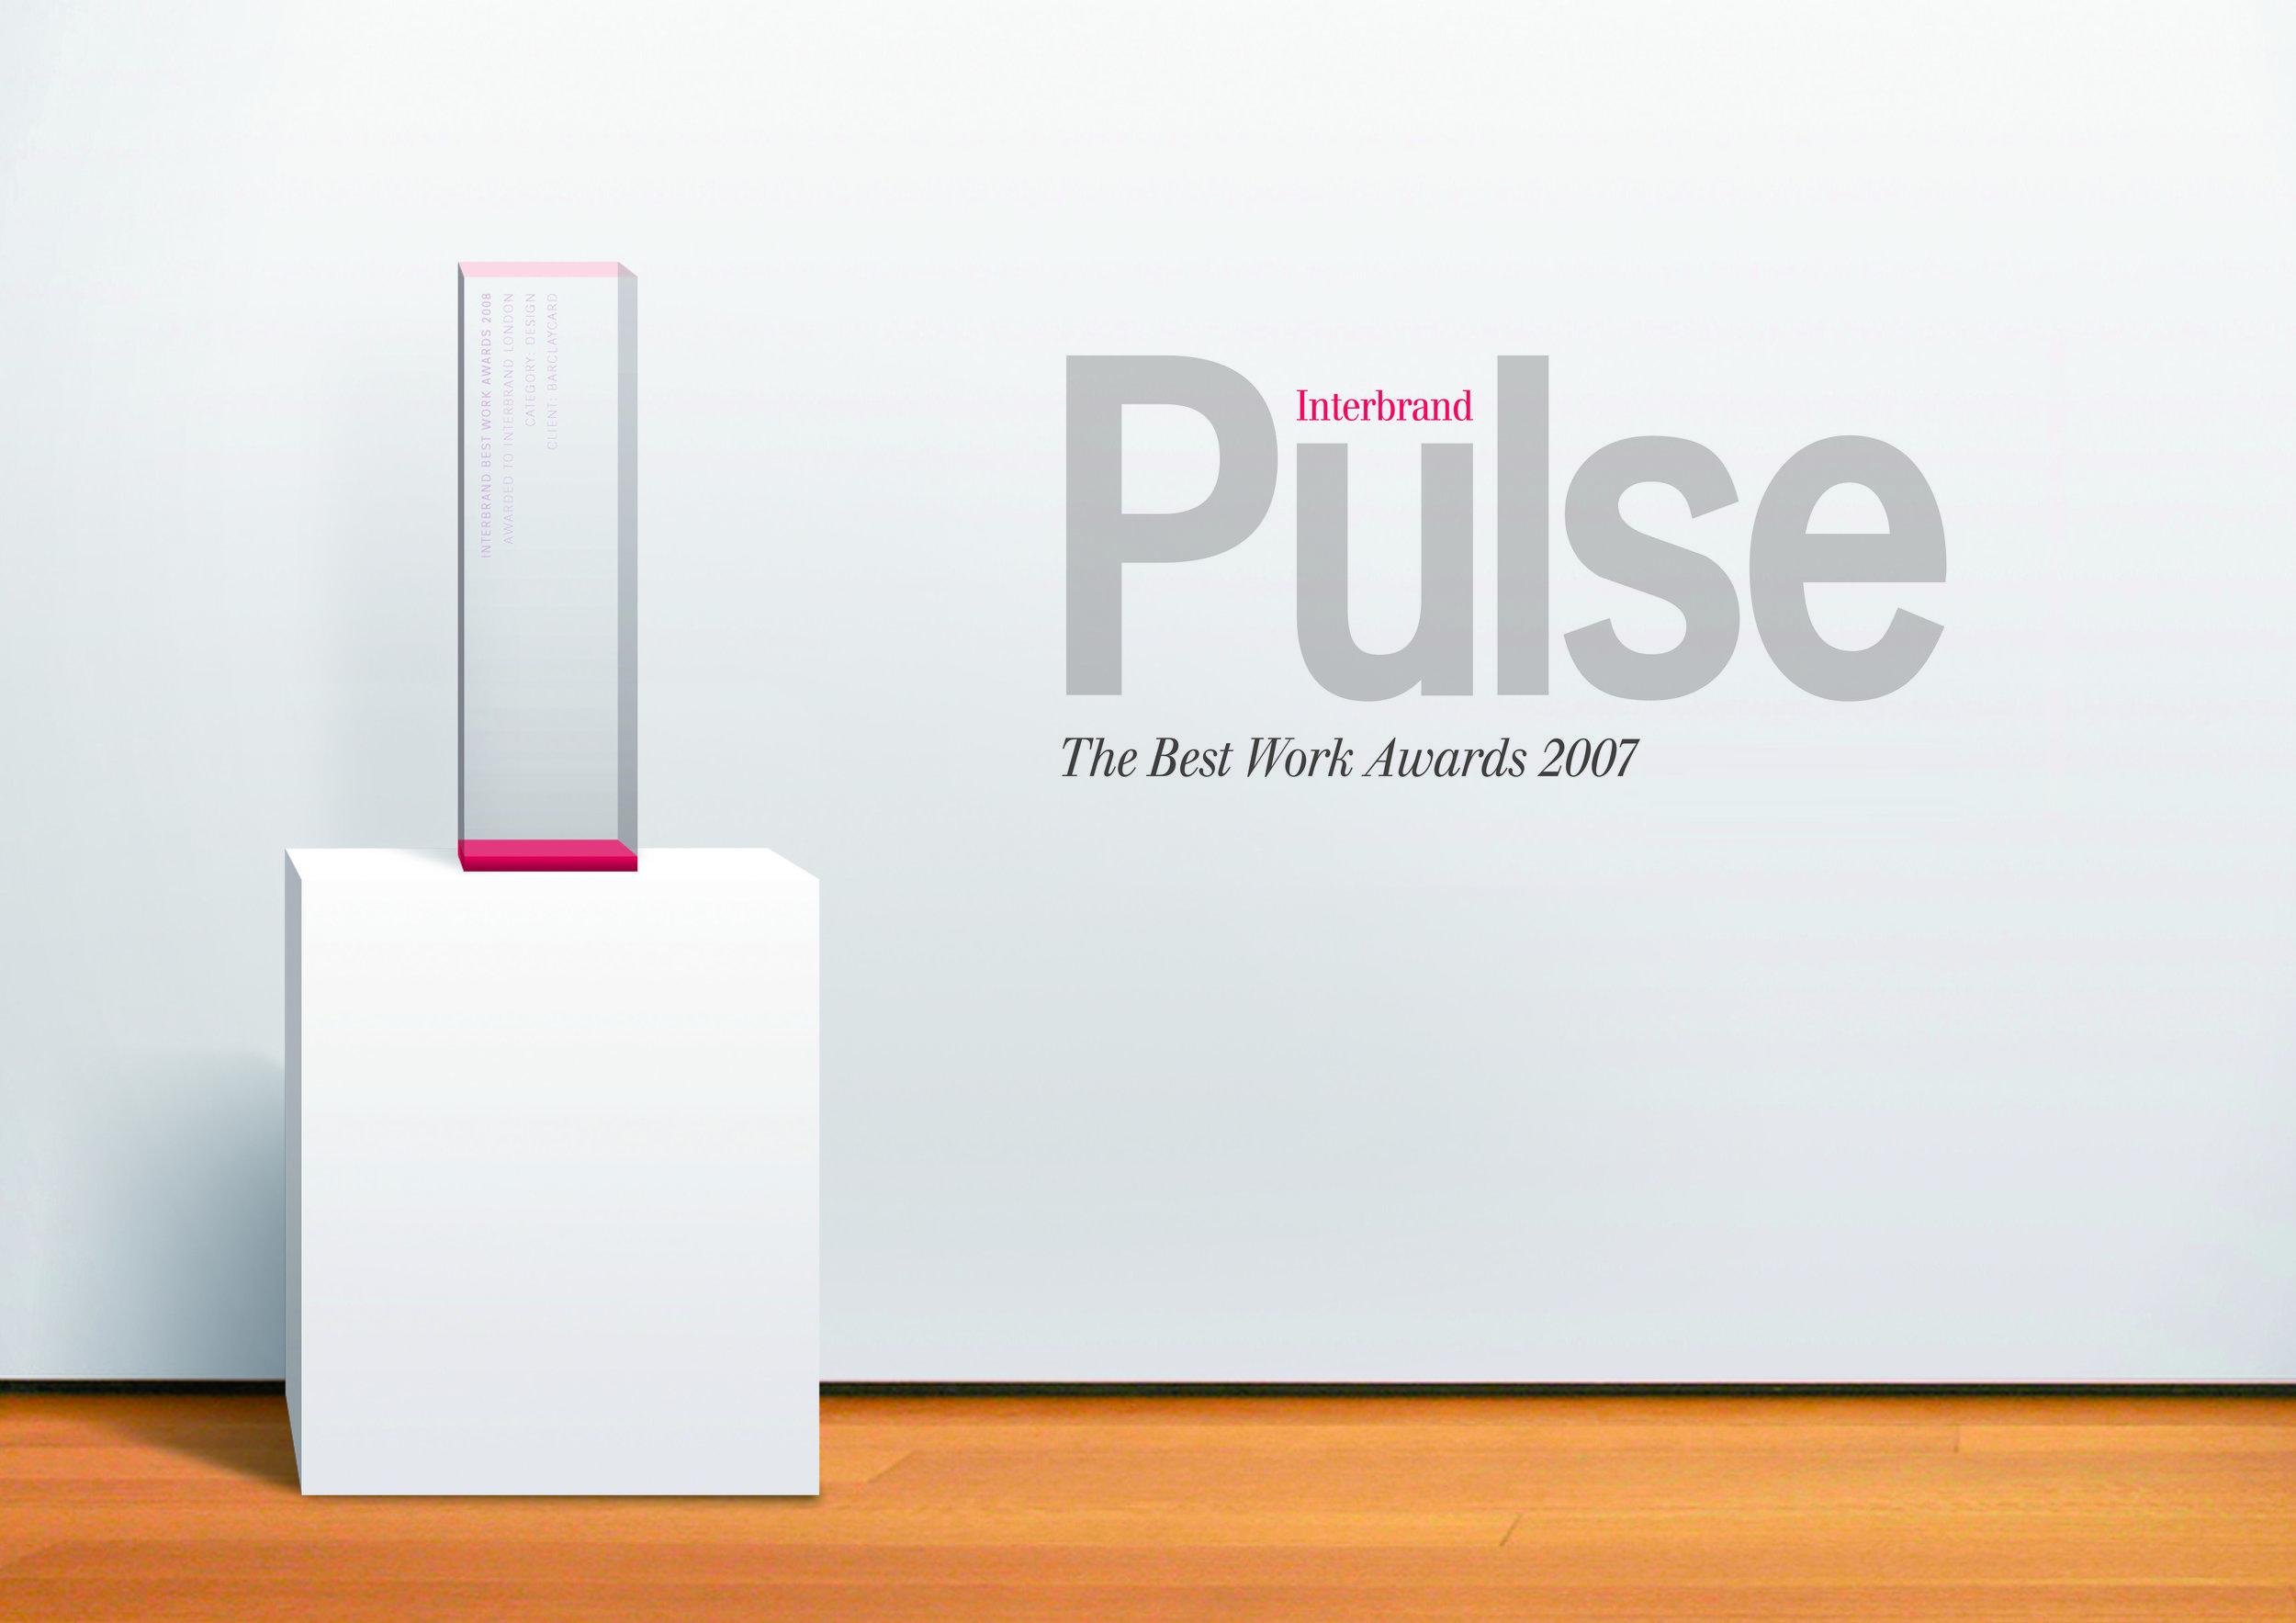 Interbrand_Pulse_Best_Work_Award_2007.jpg